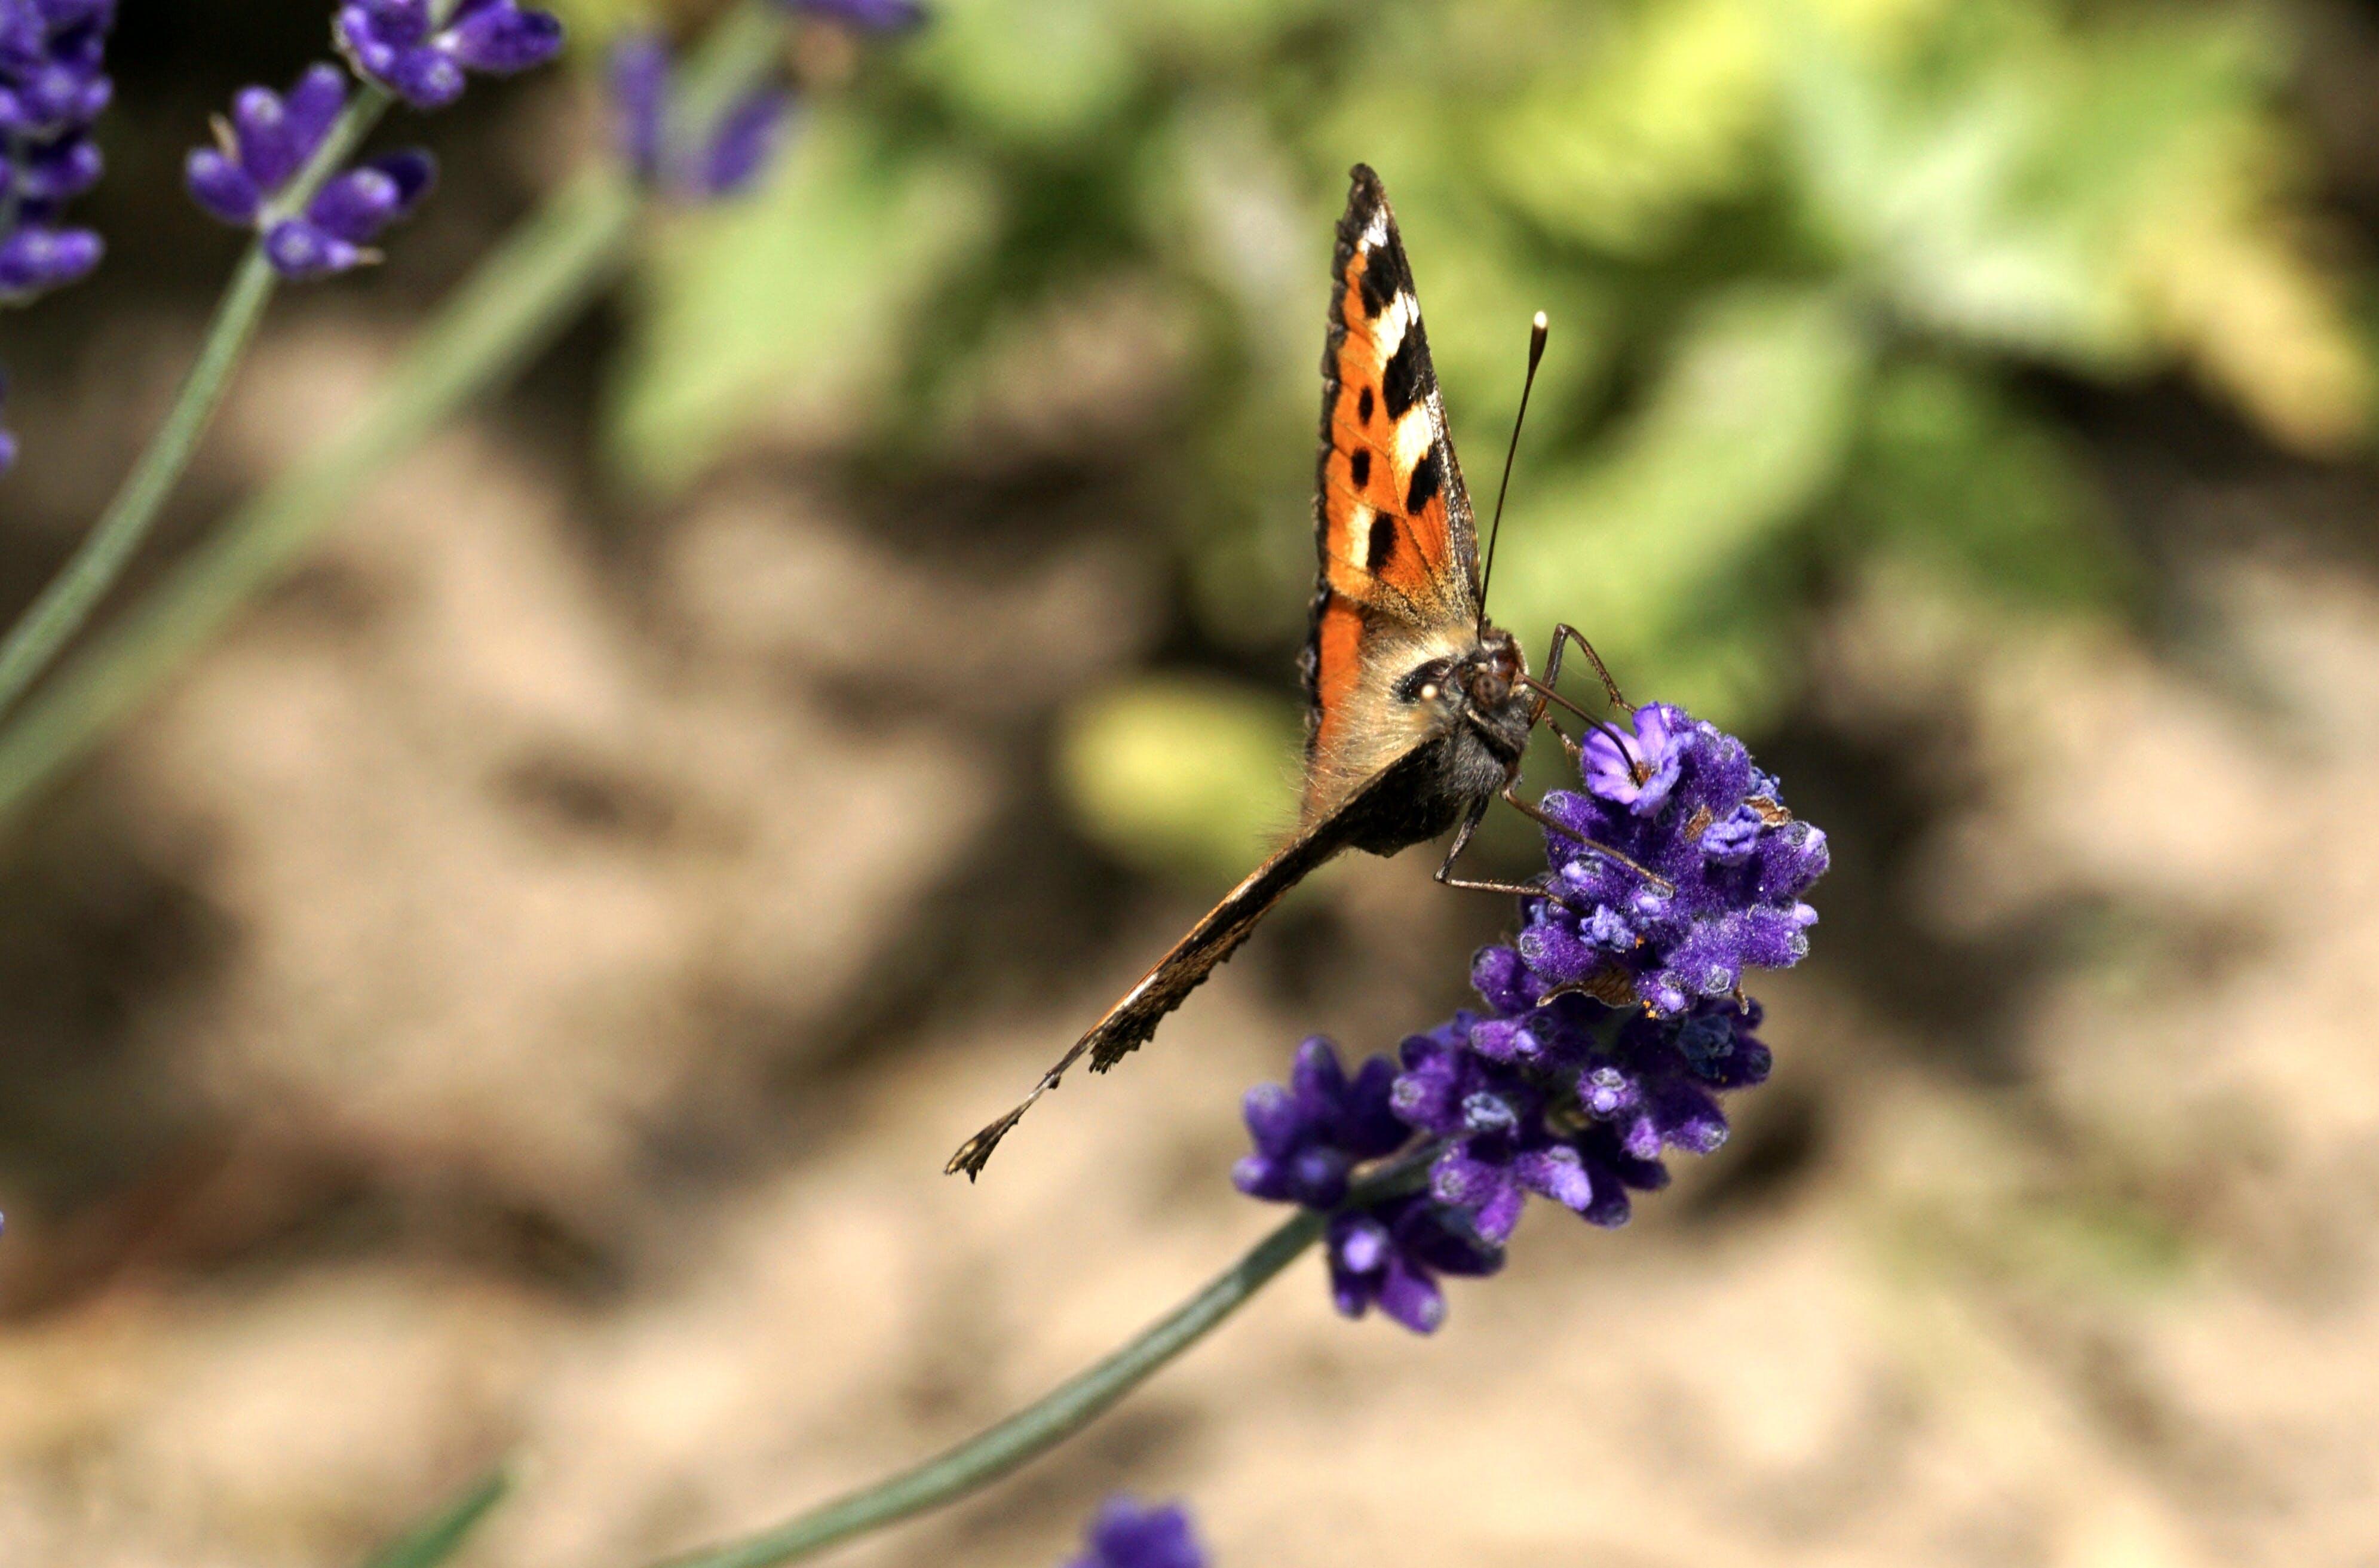 Black and Orange Butterfly on Lavender Flower